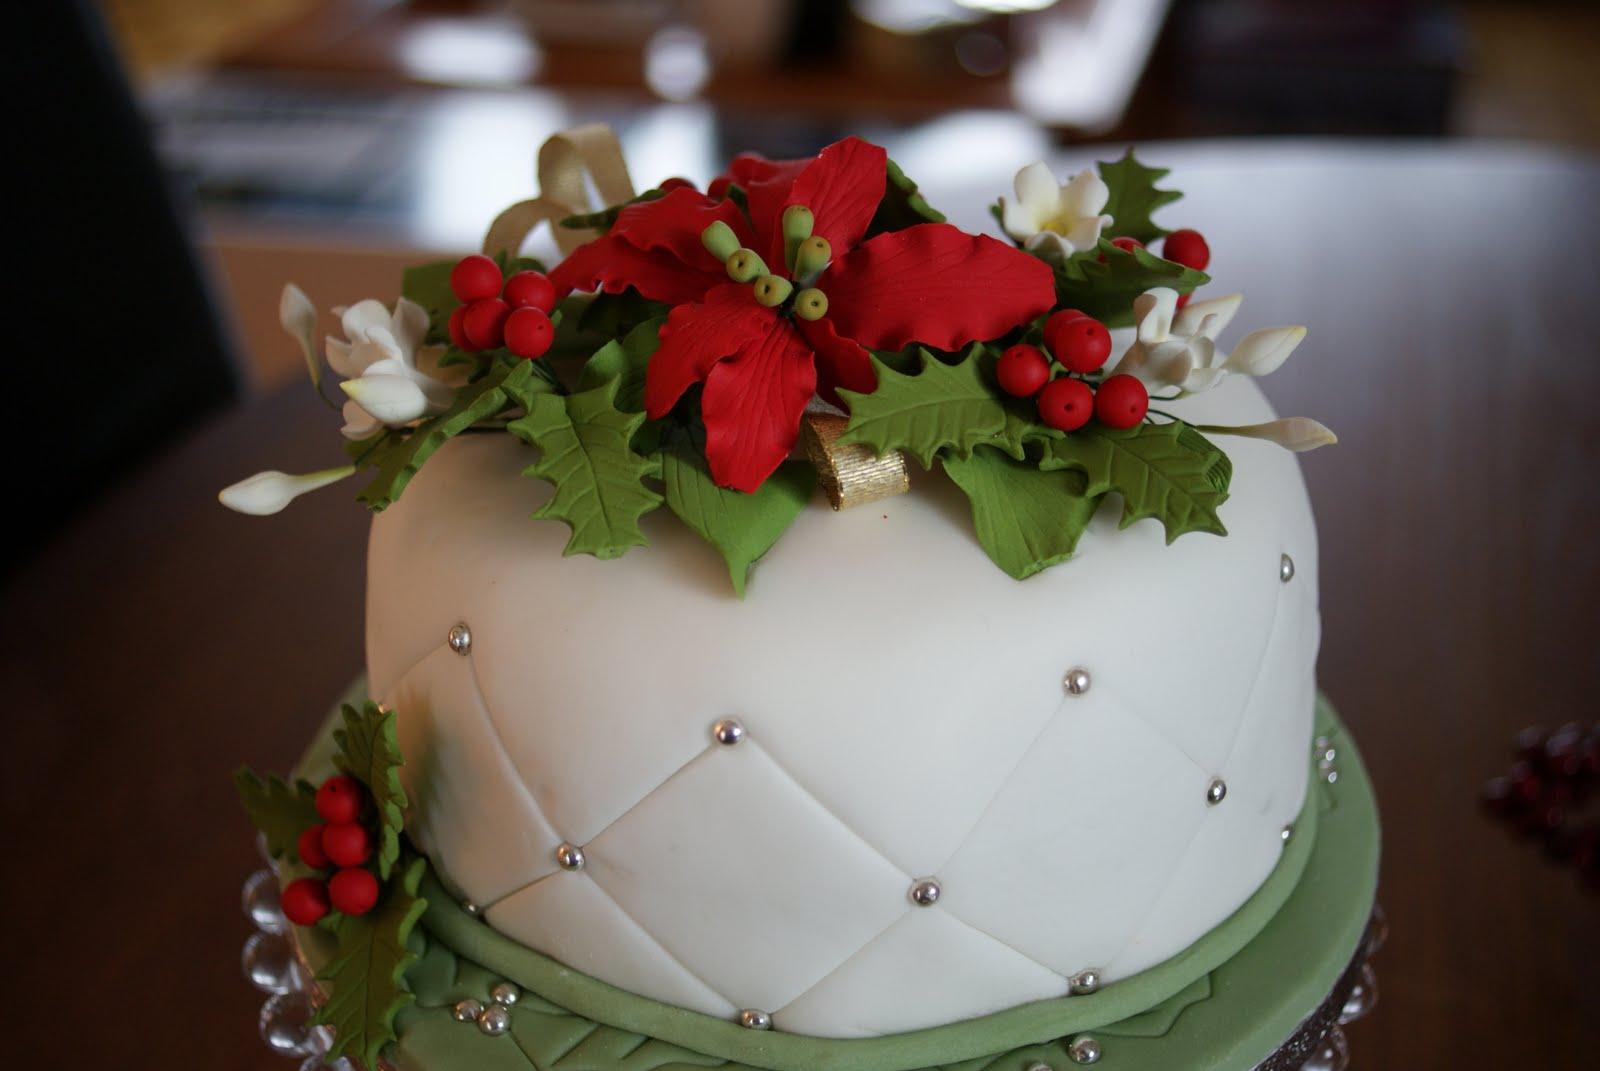 Christmas Cake Decorating Ideas Waitrose : kersttaart uitgelicht - Christmaholic.nl